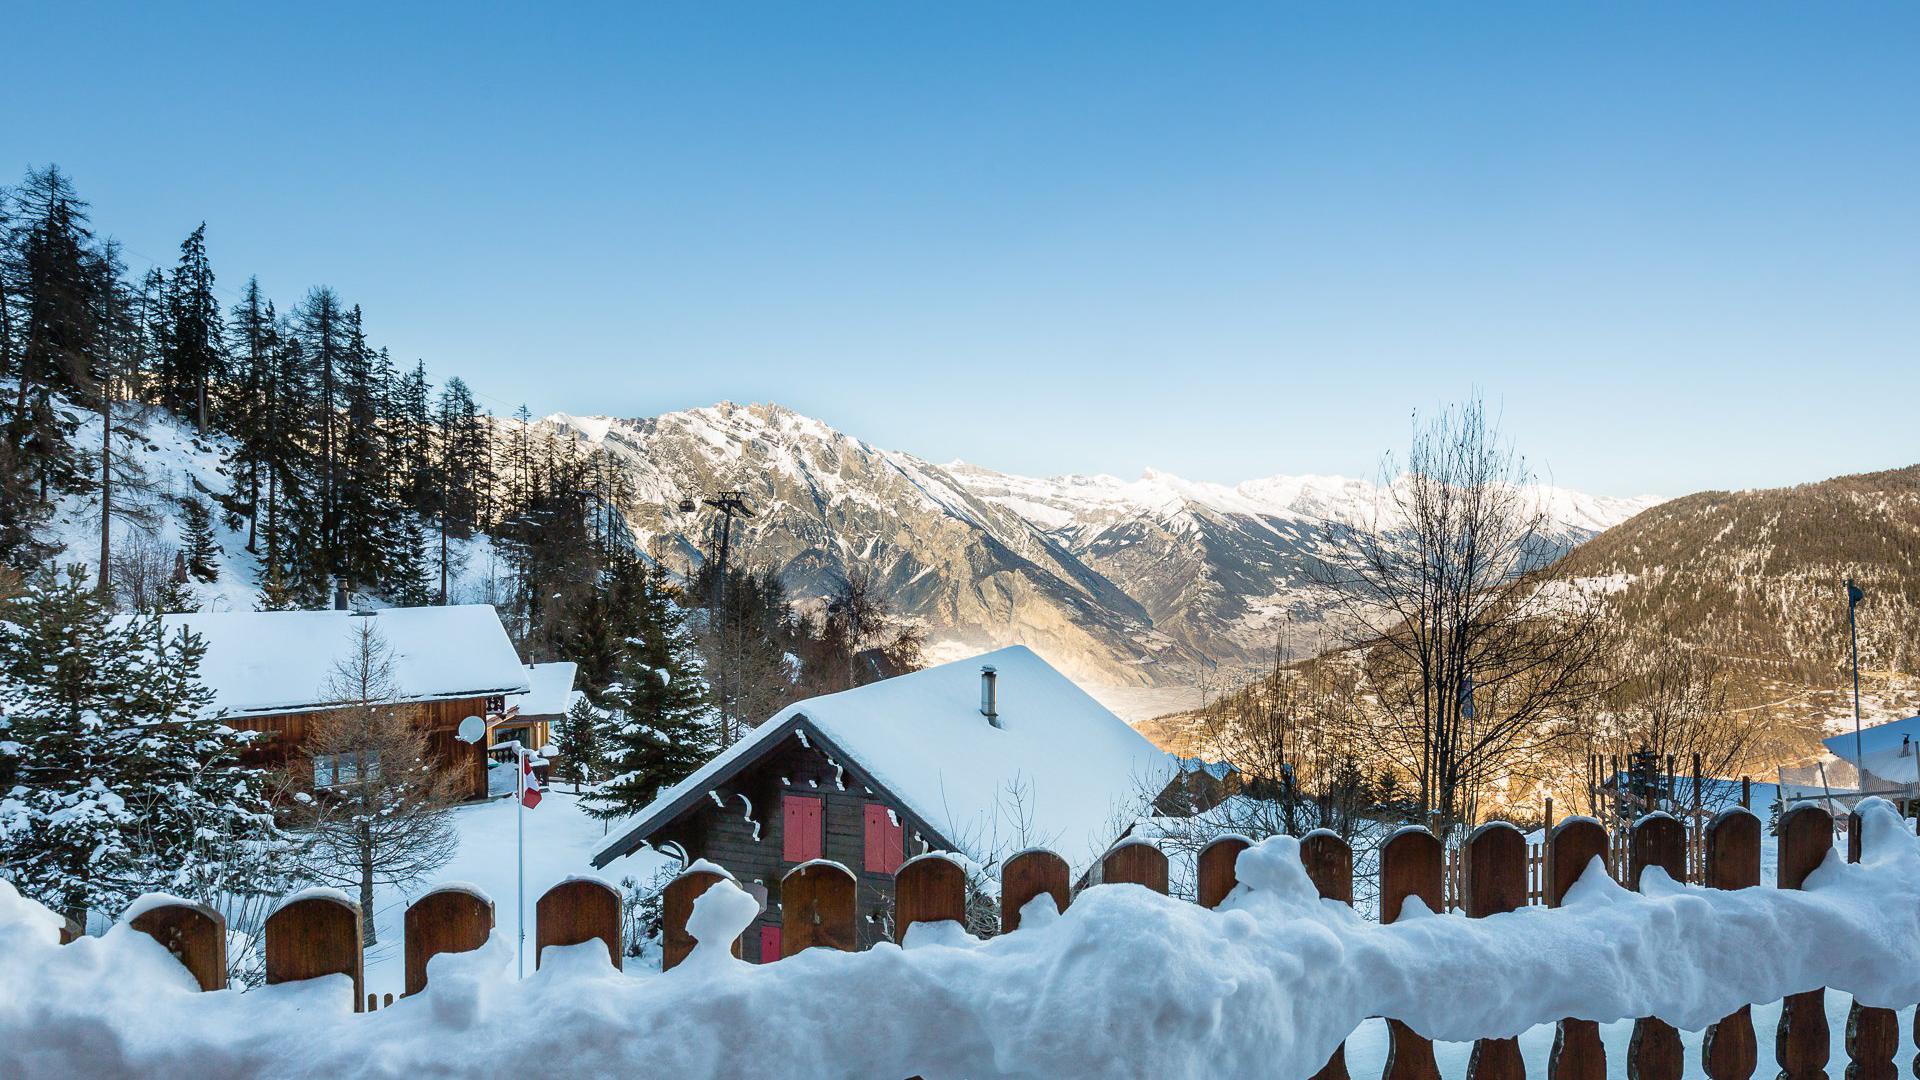 Chalet Pere Noel Chalet, Switzerland